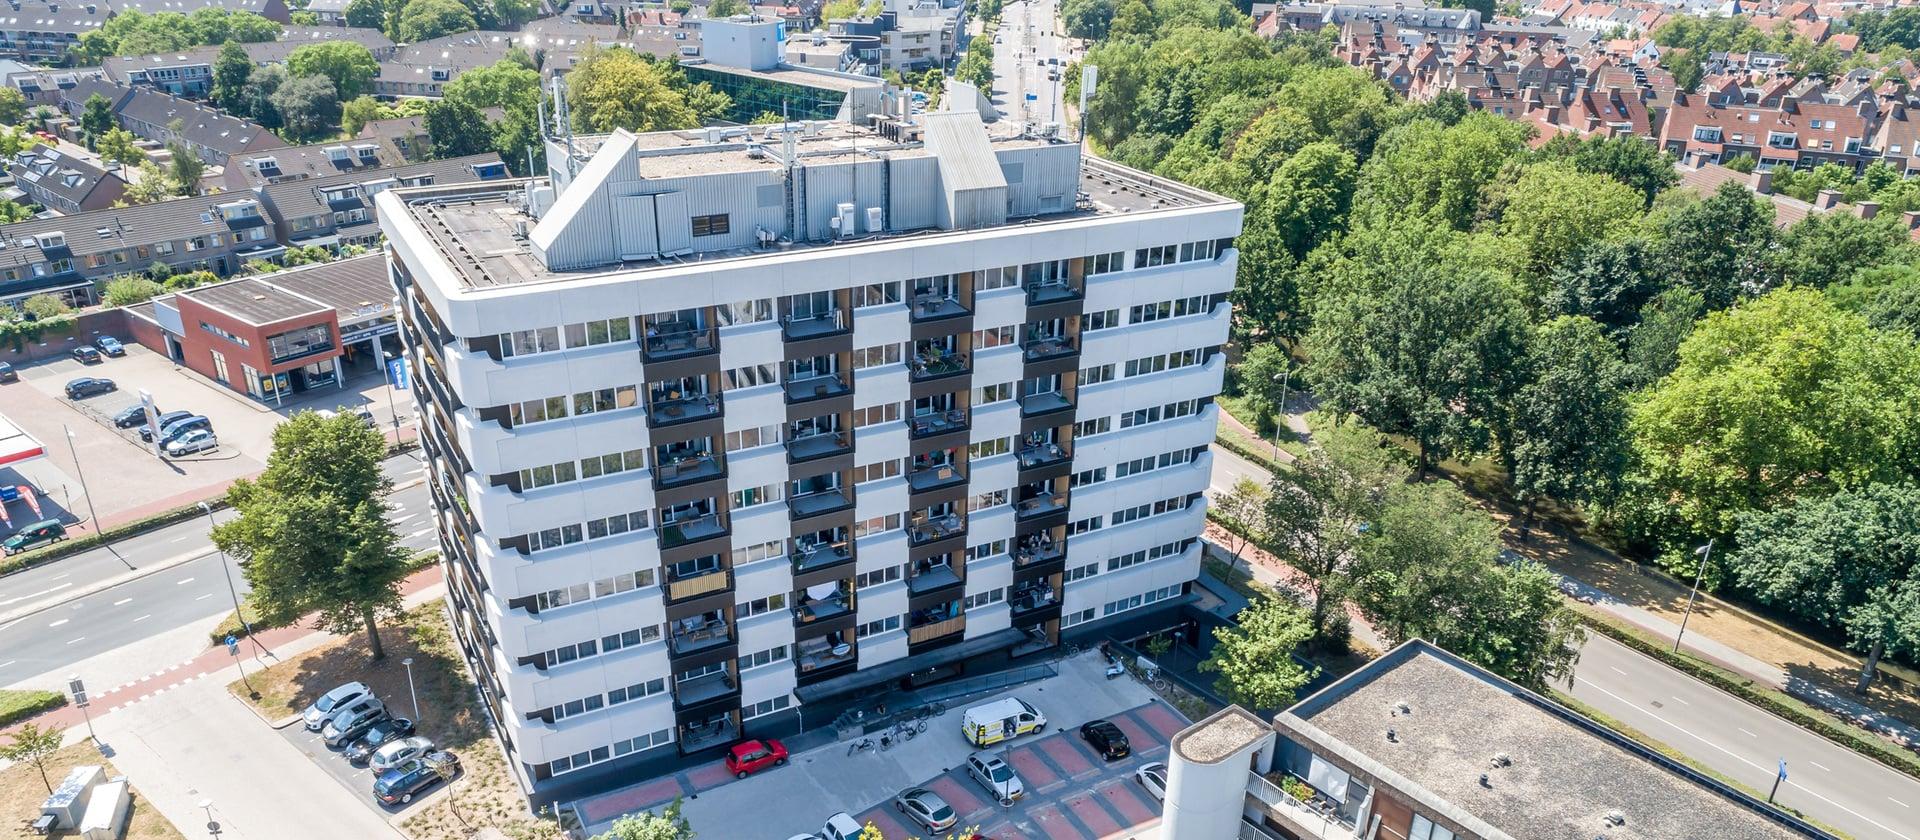 Cityside Apartments in Amersfoort